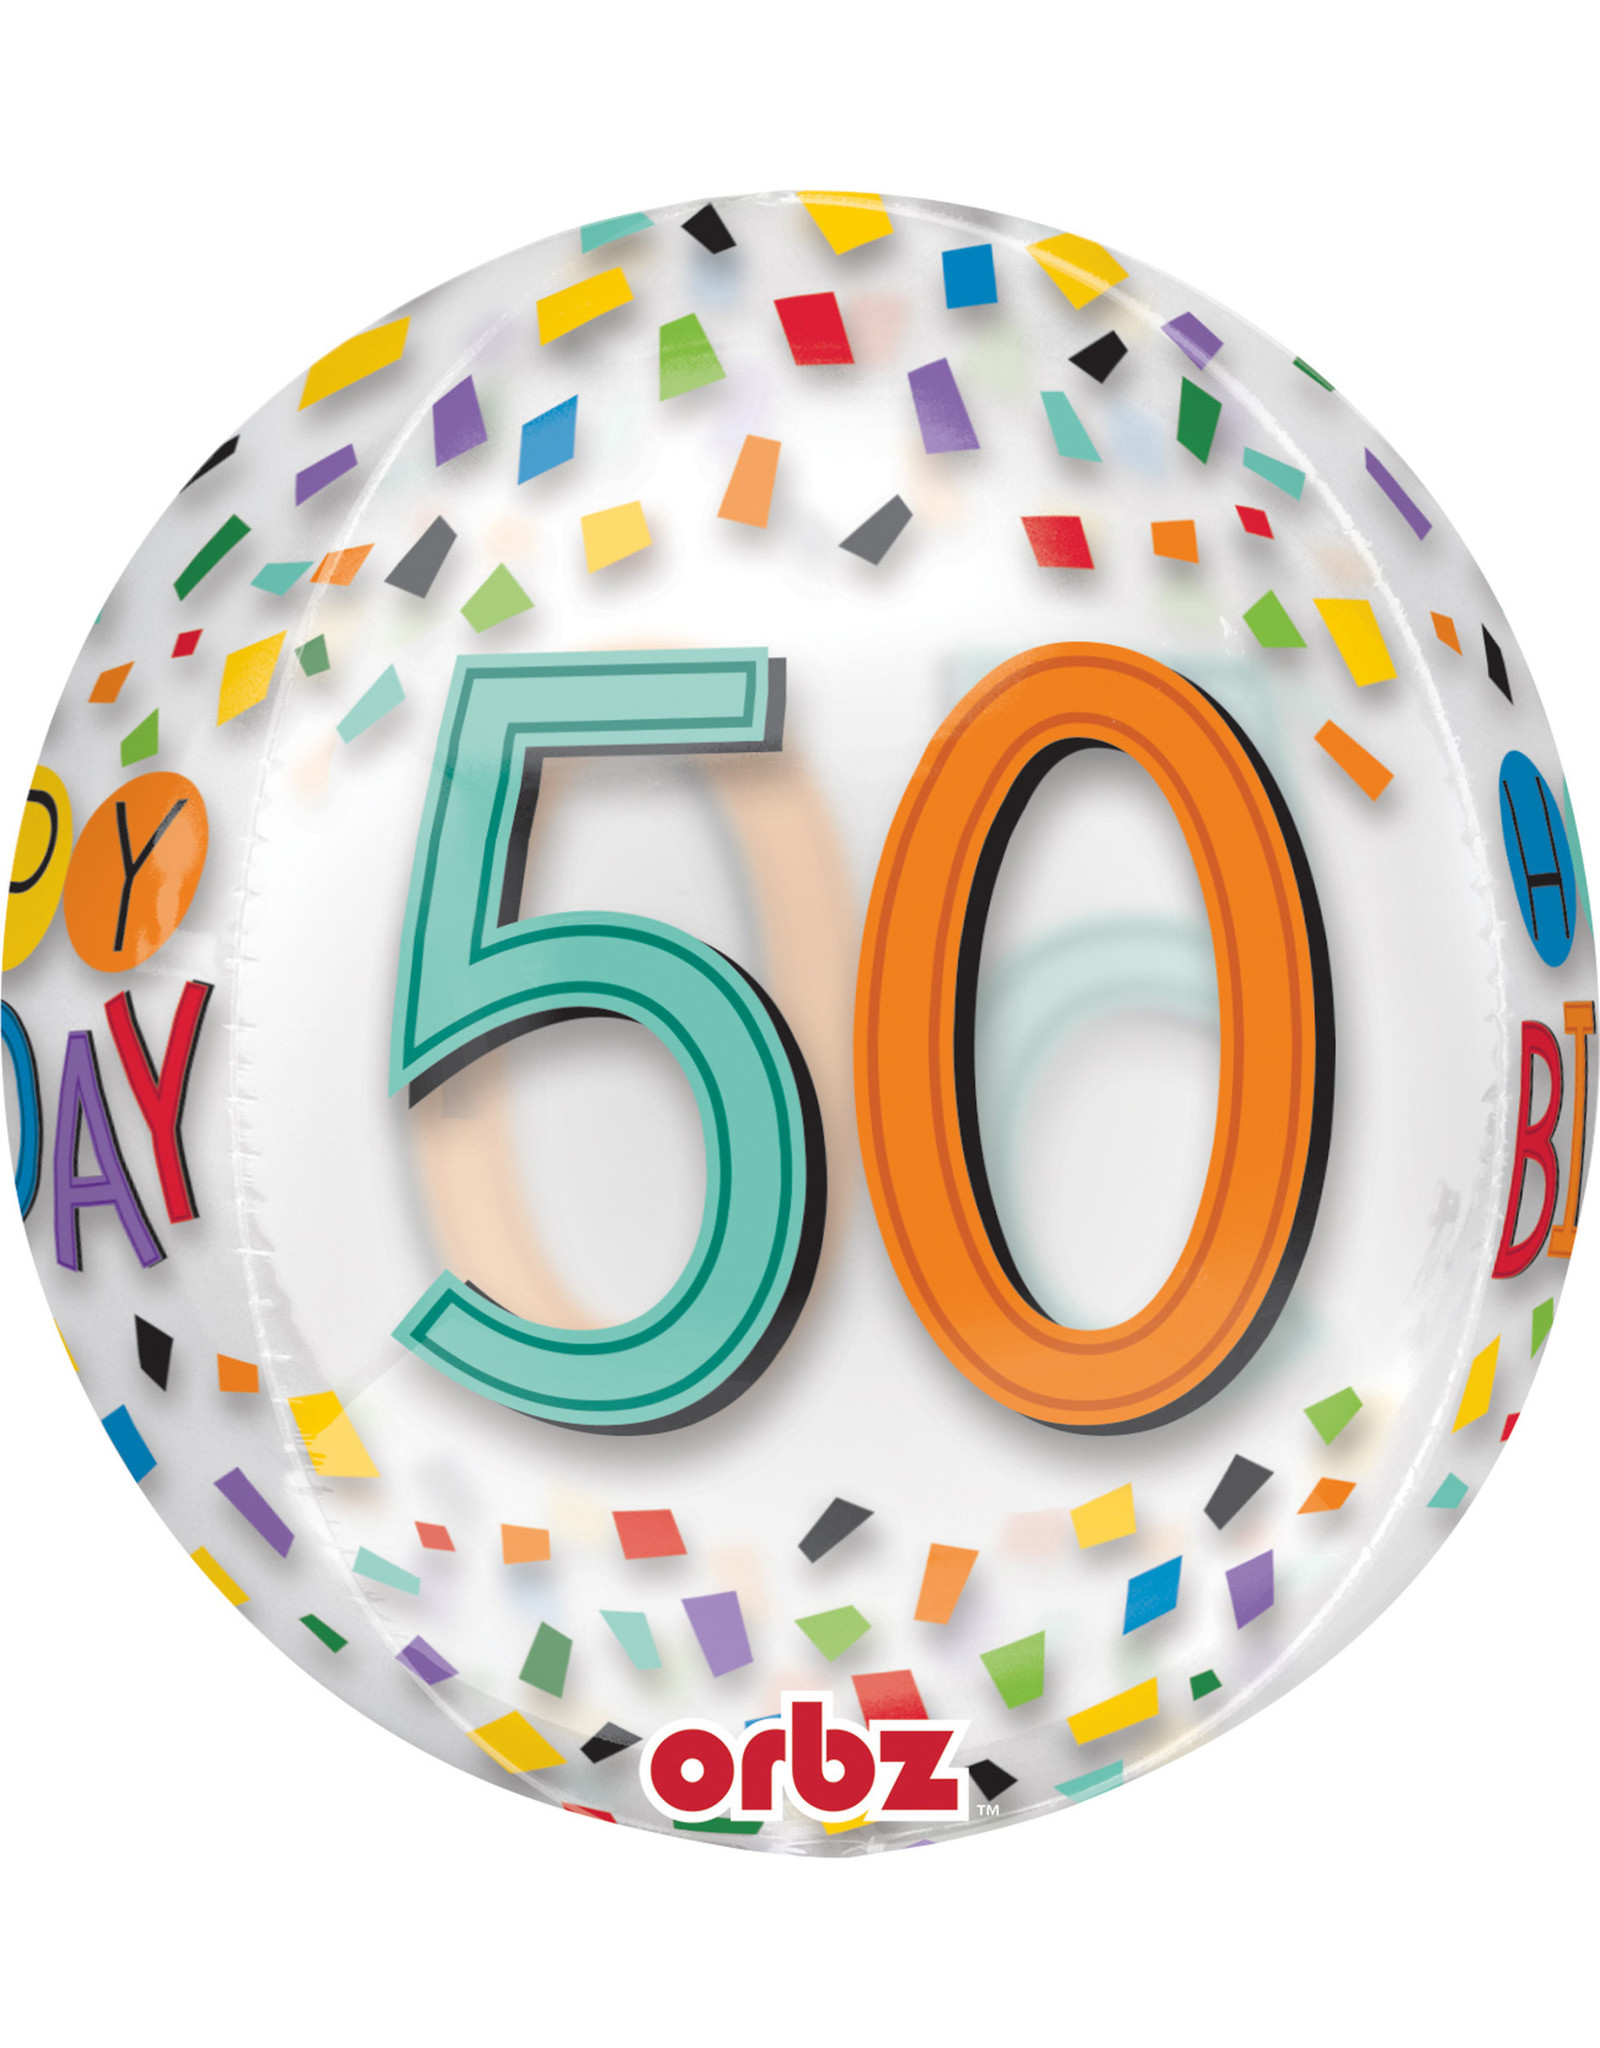 Amscan folieballon orbz confetti stijl 50 jaar 38 x 40 cm